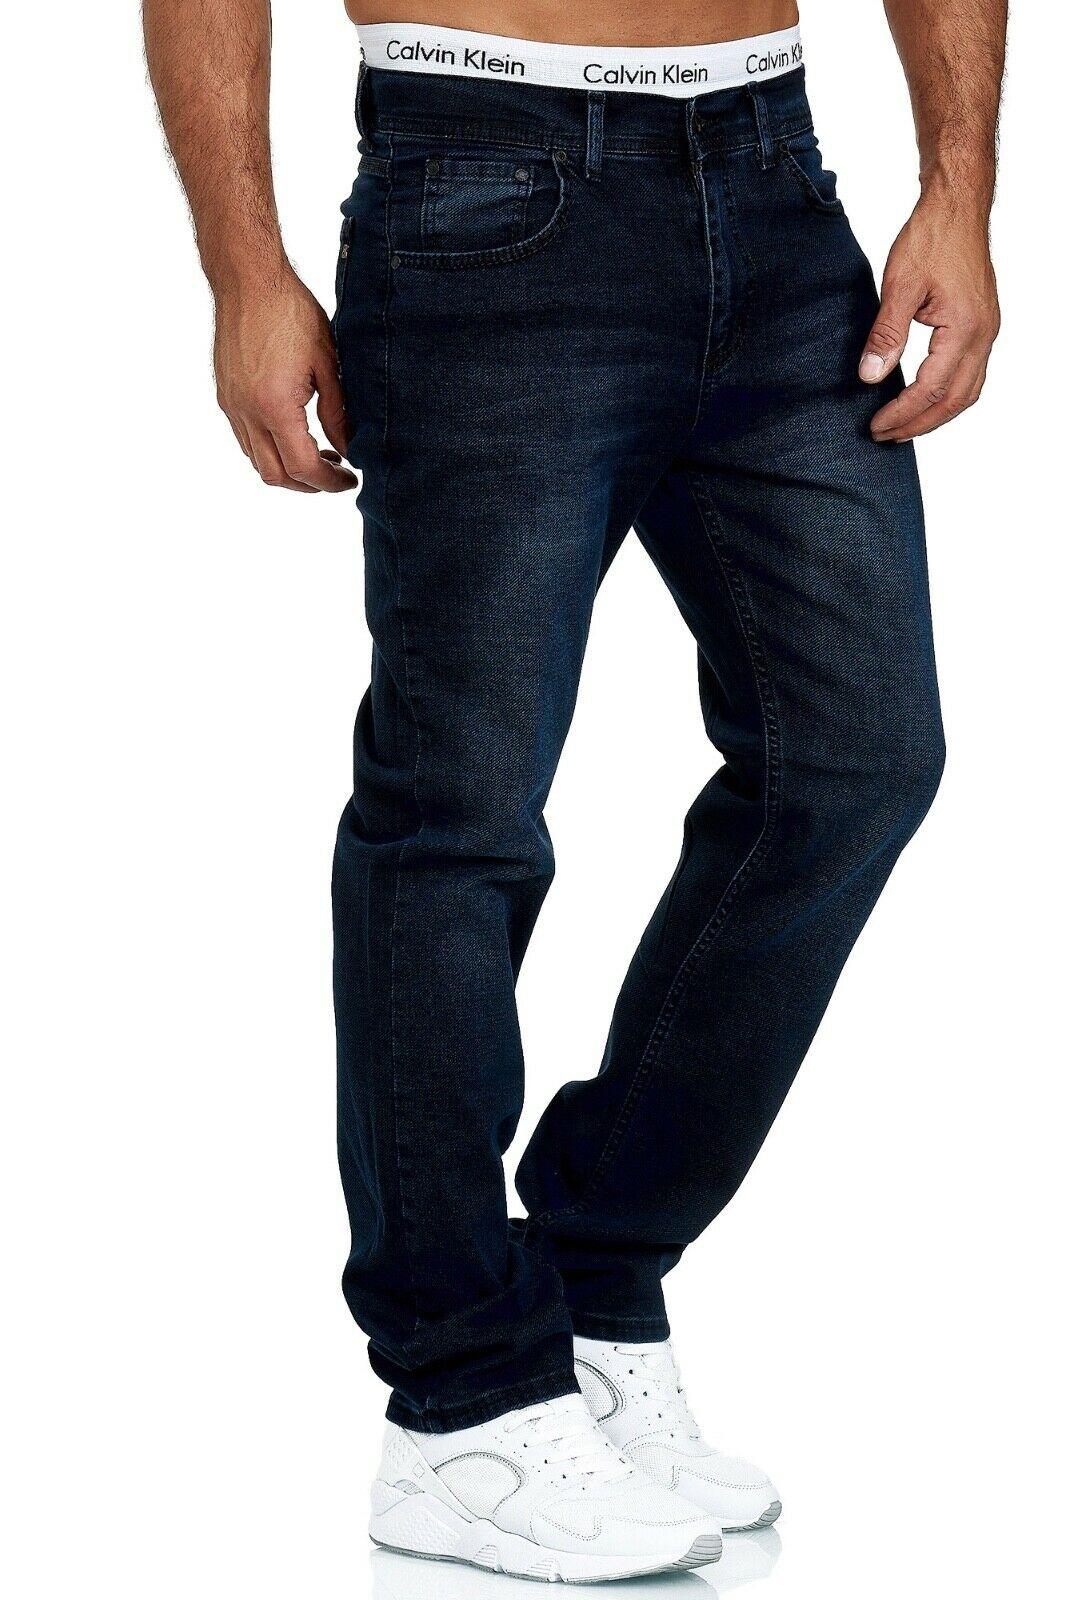 Herren-Jeans-Hose-Denim-KC-Black-Washed-Straight-Cut-Regular-Dicke-Naht-naehte Indexbild 88